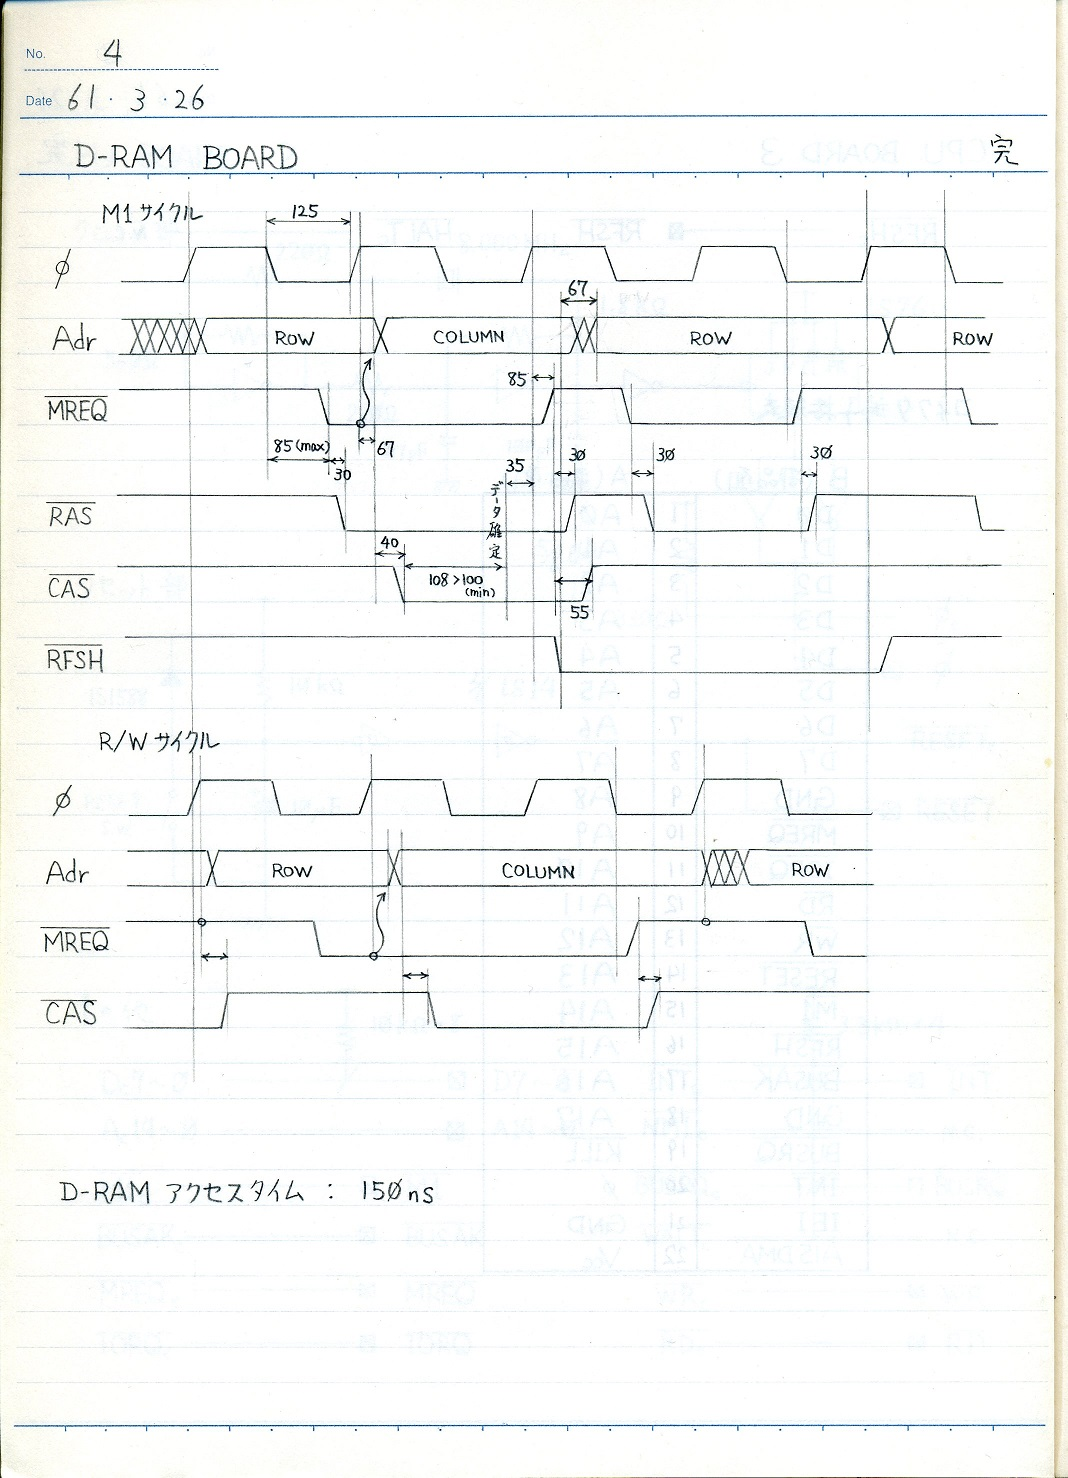 D-RAM timing chart